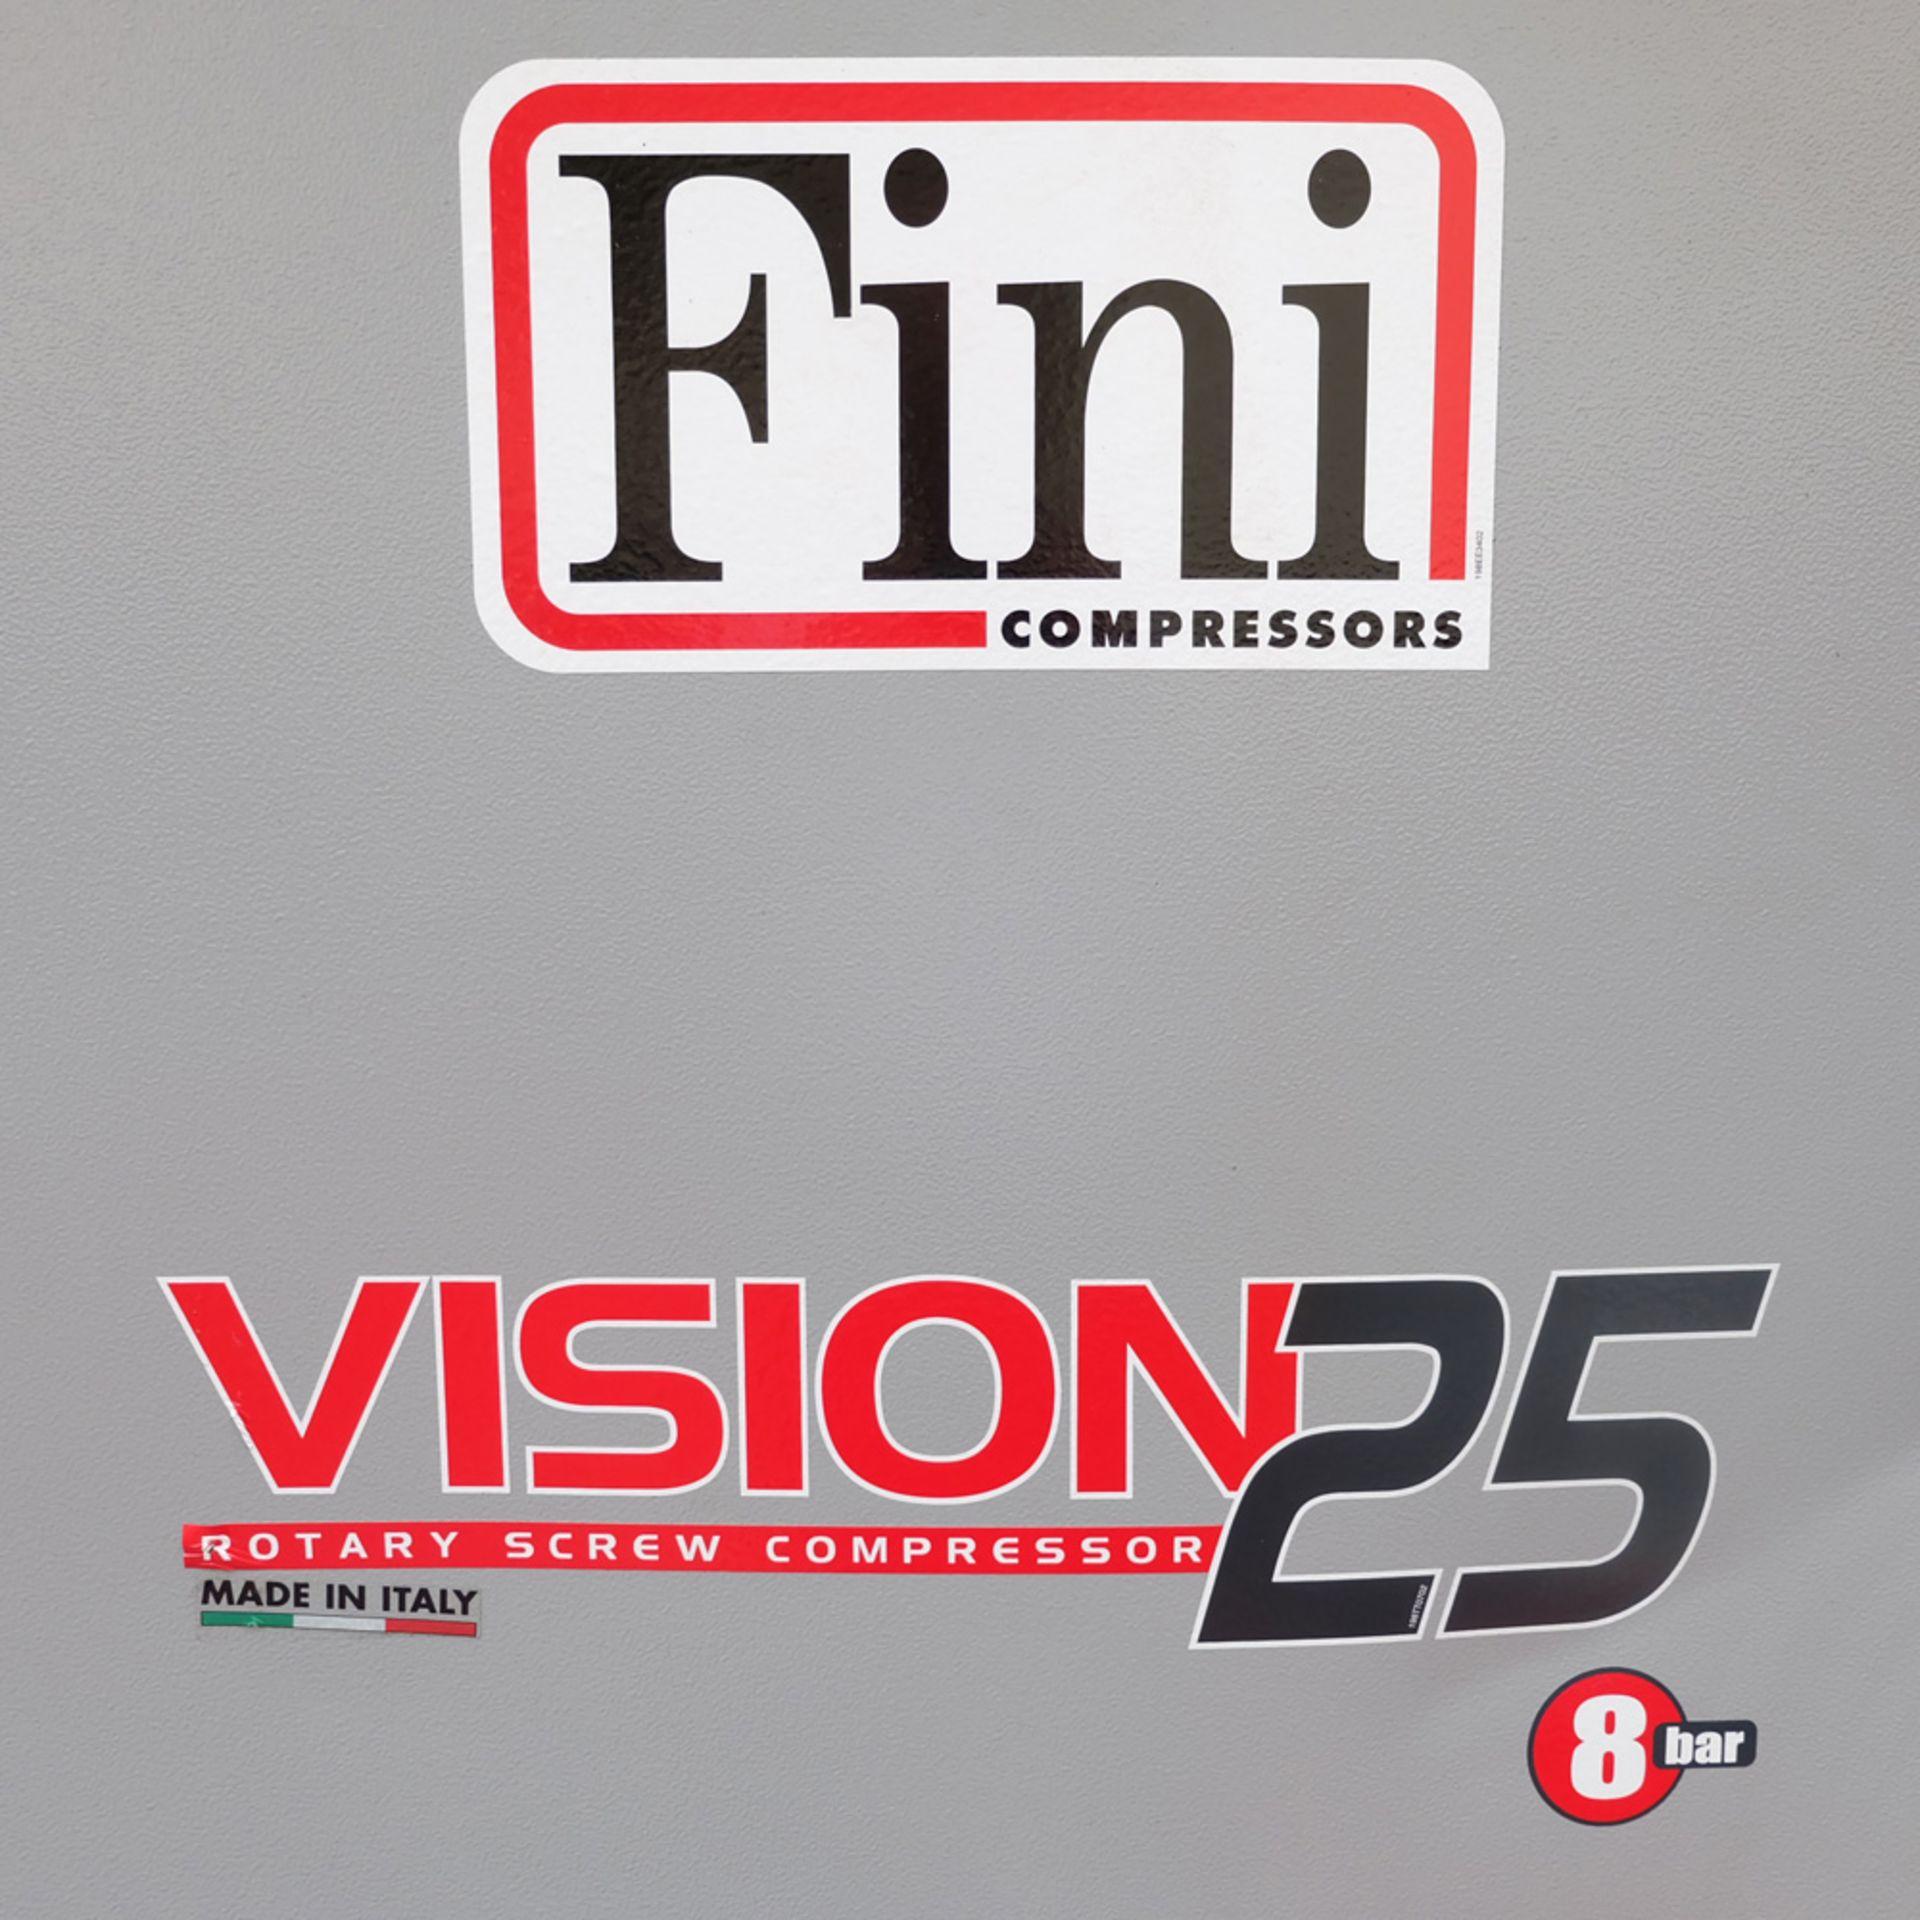 FINI VISION 25 Rotary Screw Compressor. - Image 3 of 11